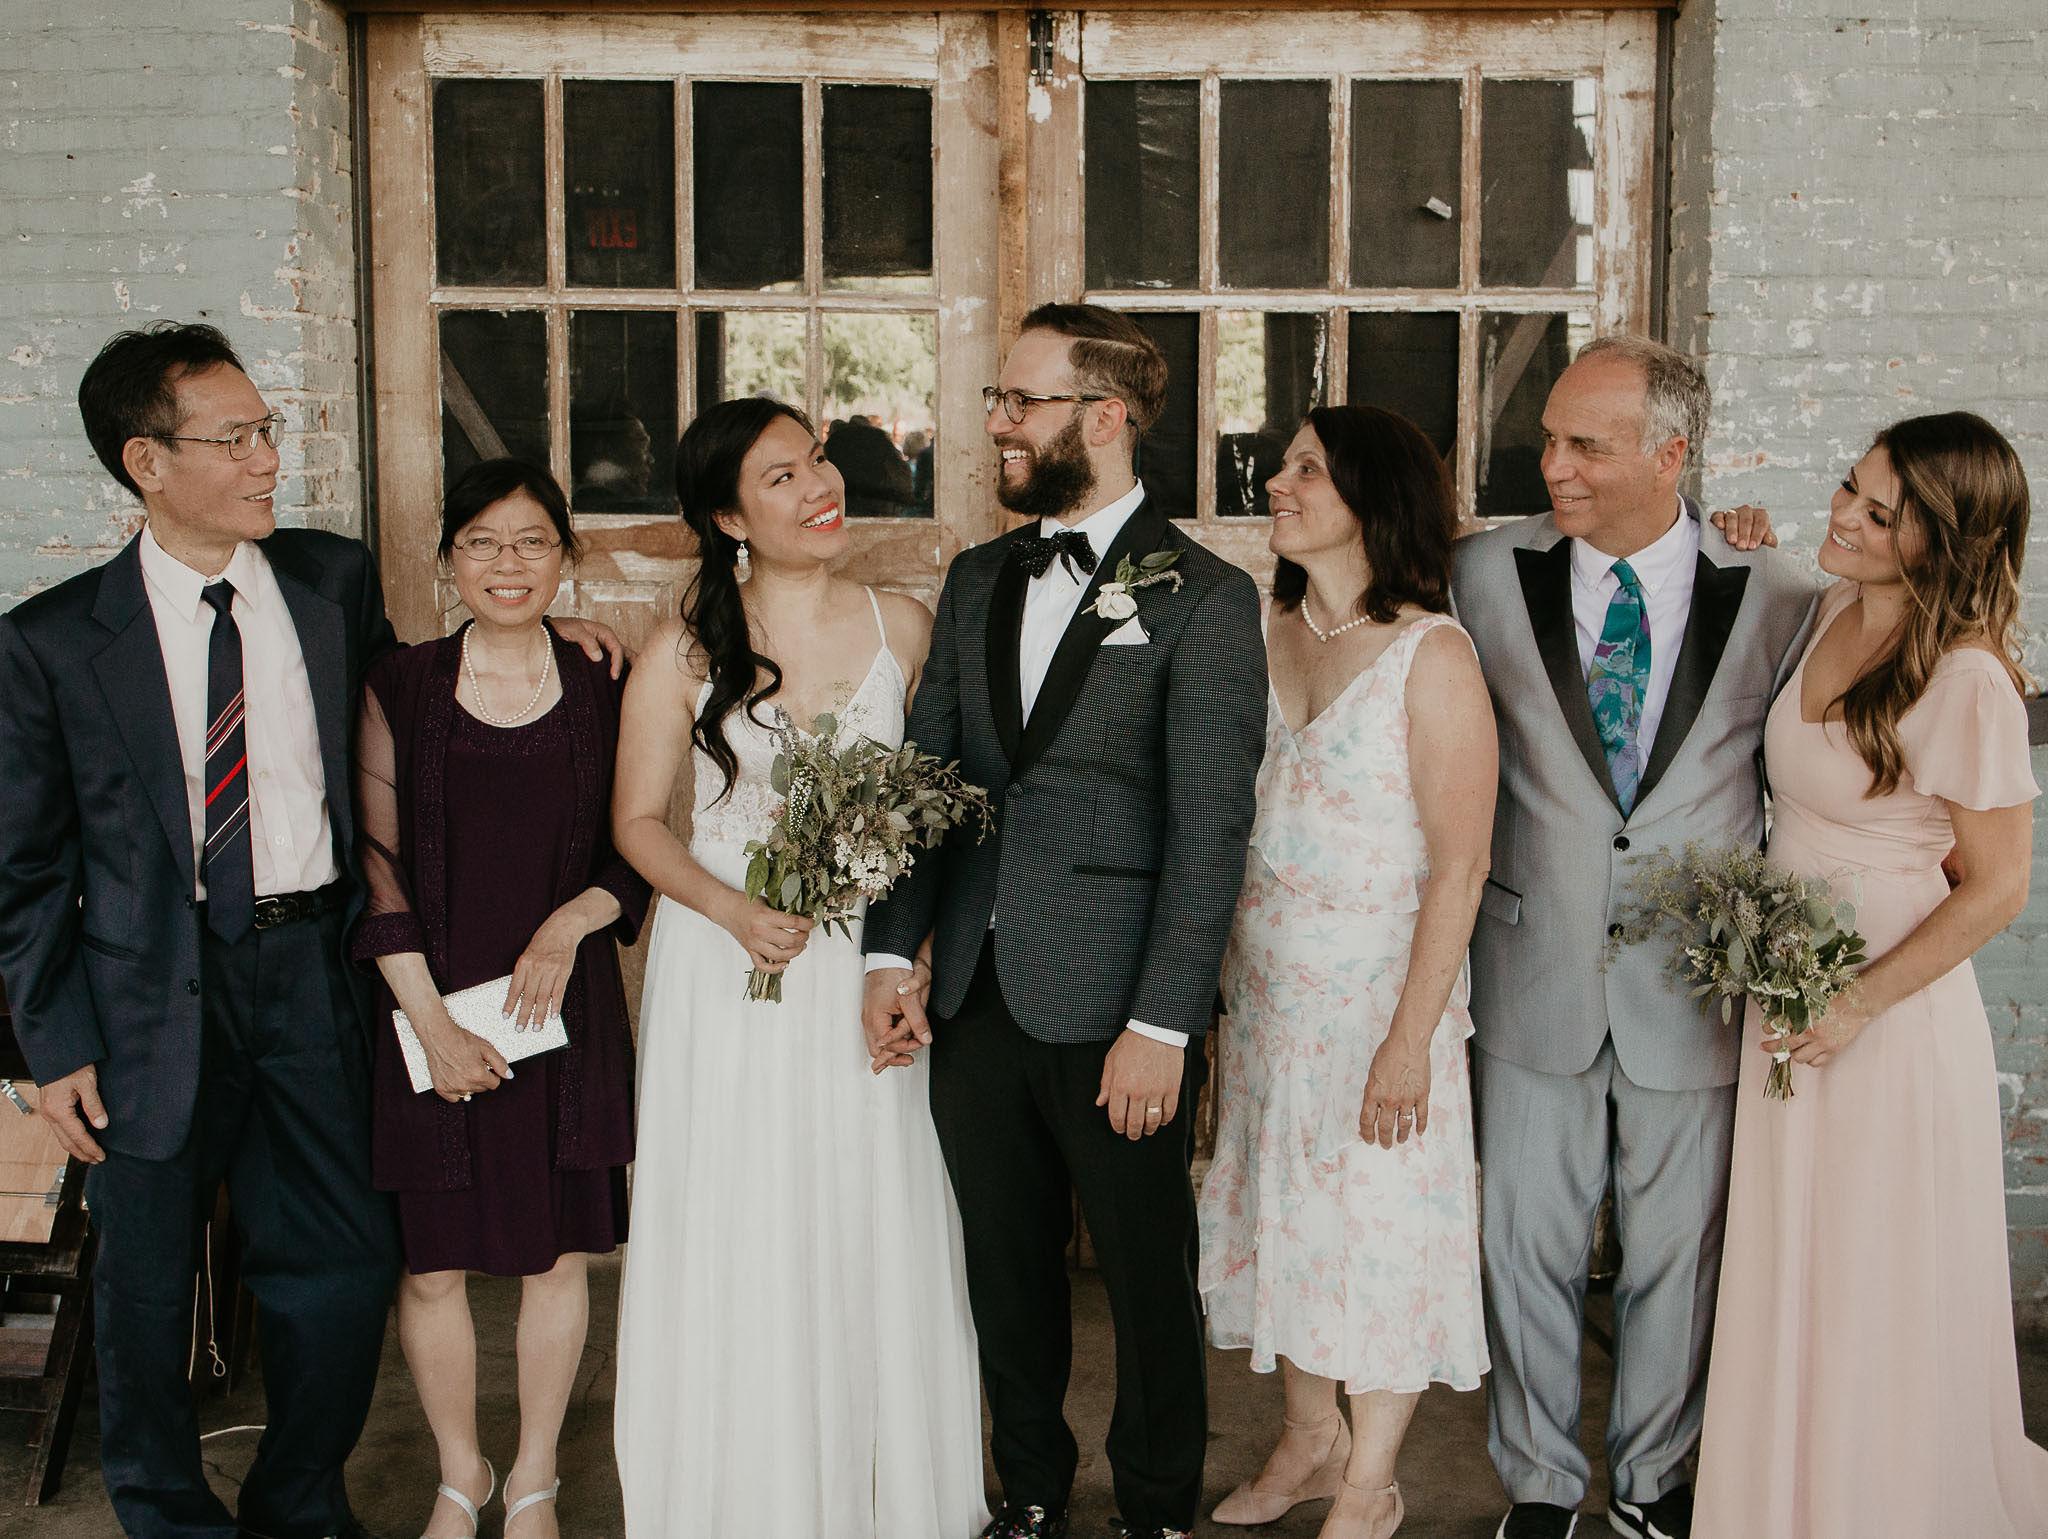 Jess+Matt_wedding-326.JPG